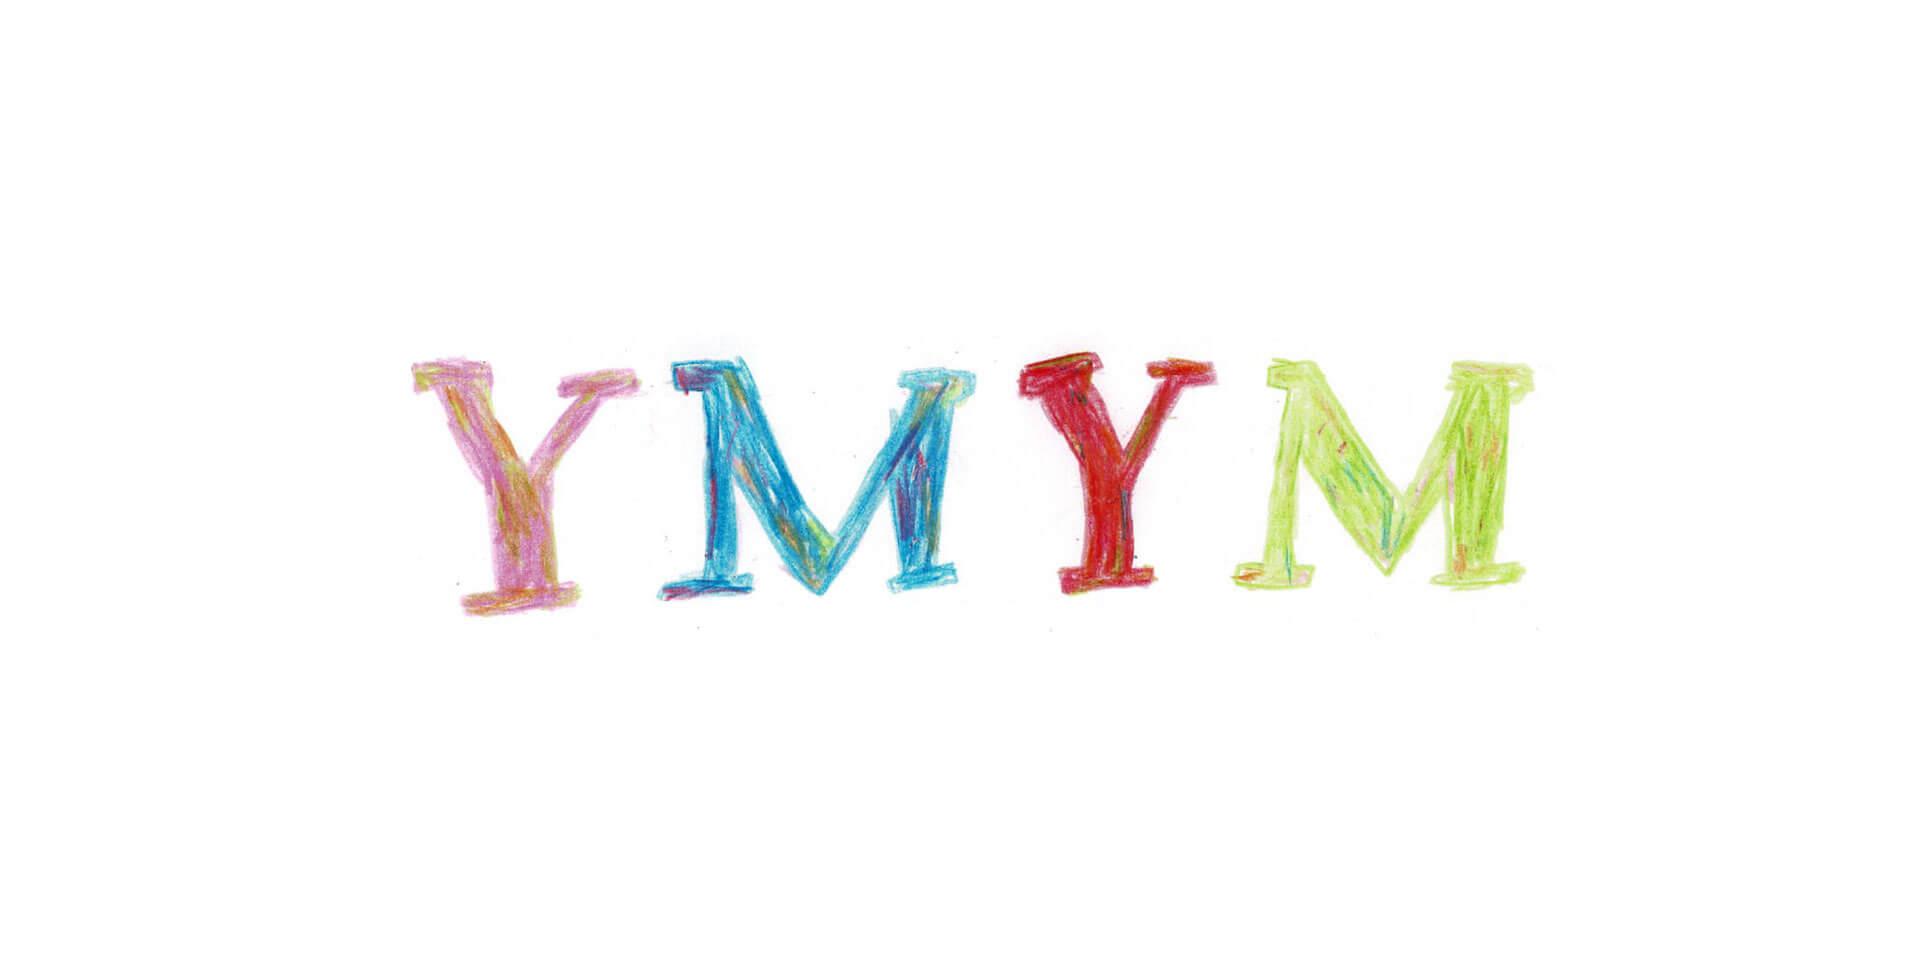 CHAIのベーシスト・YUUKIによるプロジェクト「YMYM」よりファッションブランドオープン!2021年春夏コレクション&描き下ろし絵画などの展示会も life210405_ymym_17